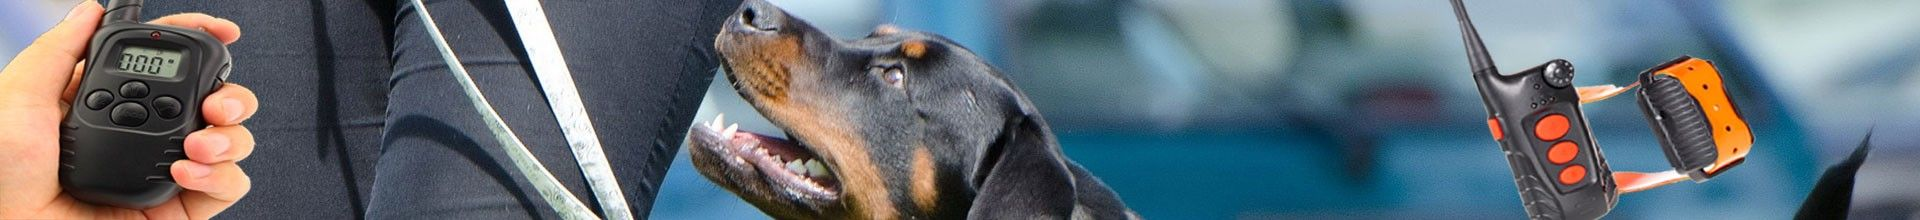 Training collar for dog education.